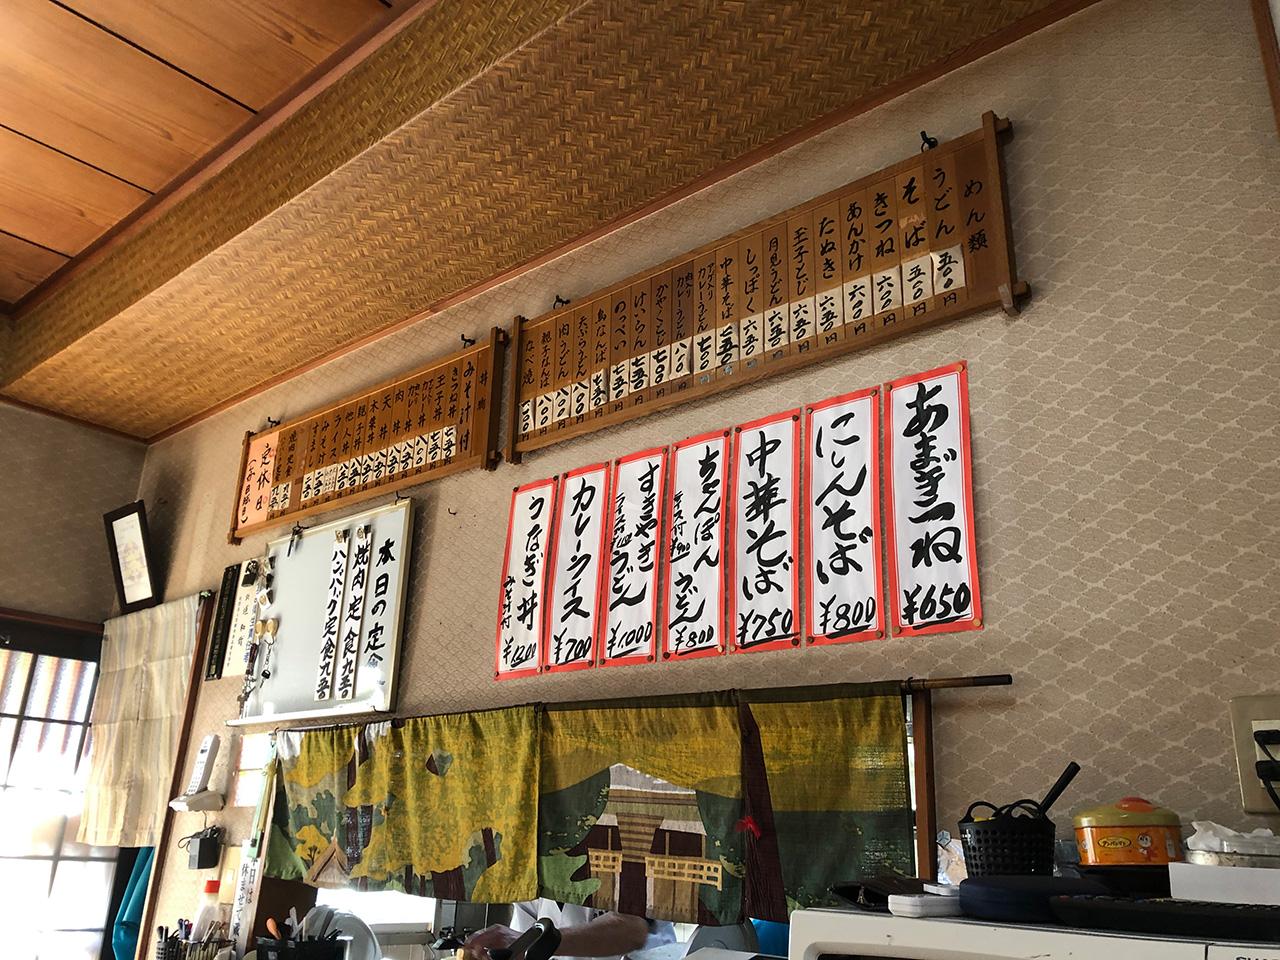 松原通宮川筋の〈力餅食堂・北垣商店〉